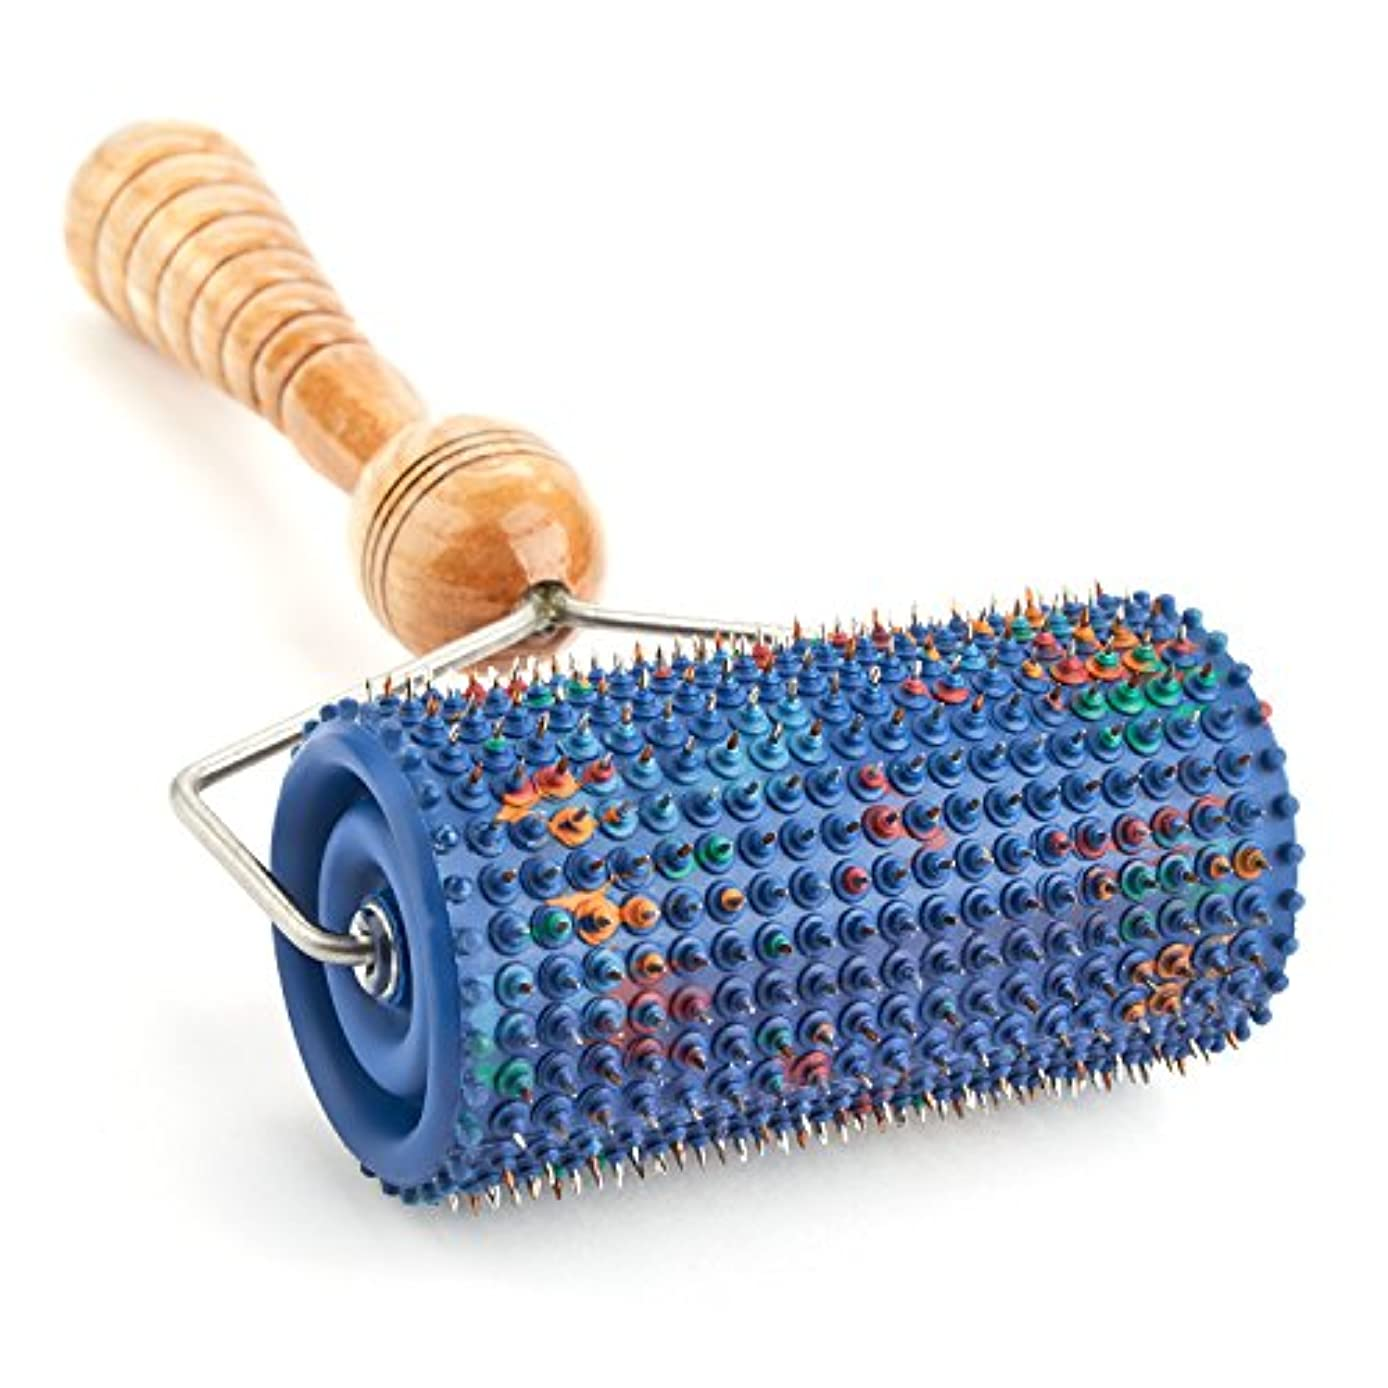 LYAPKOビッグローラーマッサージャー5.0 シルバーコーティング 指圧570針使用。体の広範囲のマッサージ用。ユニークなアプリケーター治療 セルフ ダイナミック マッサージ ツール Big Roller Massager...